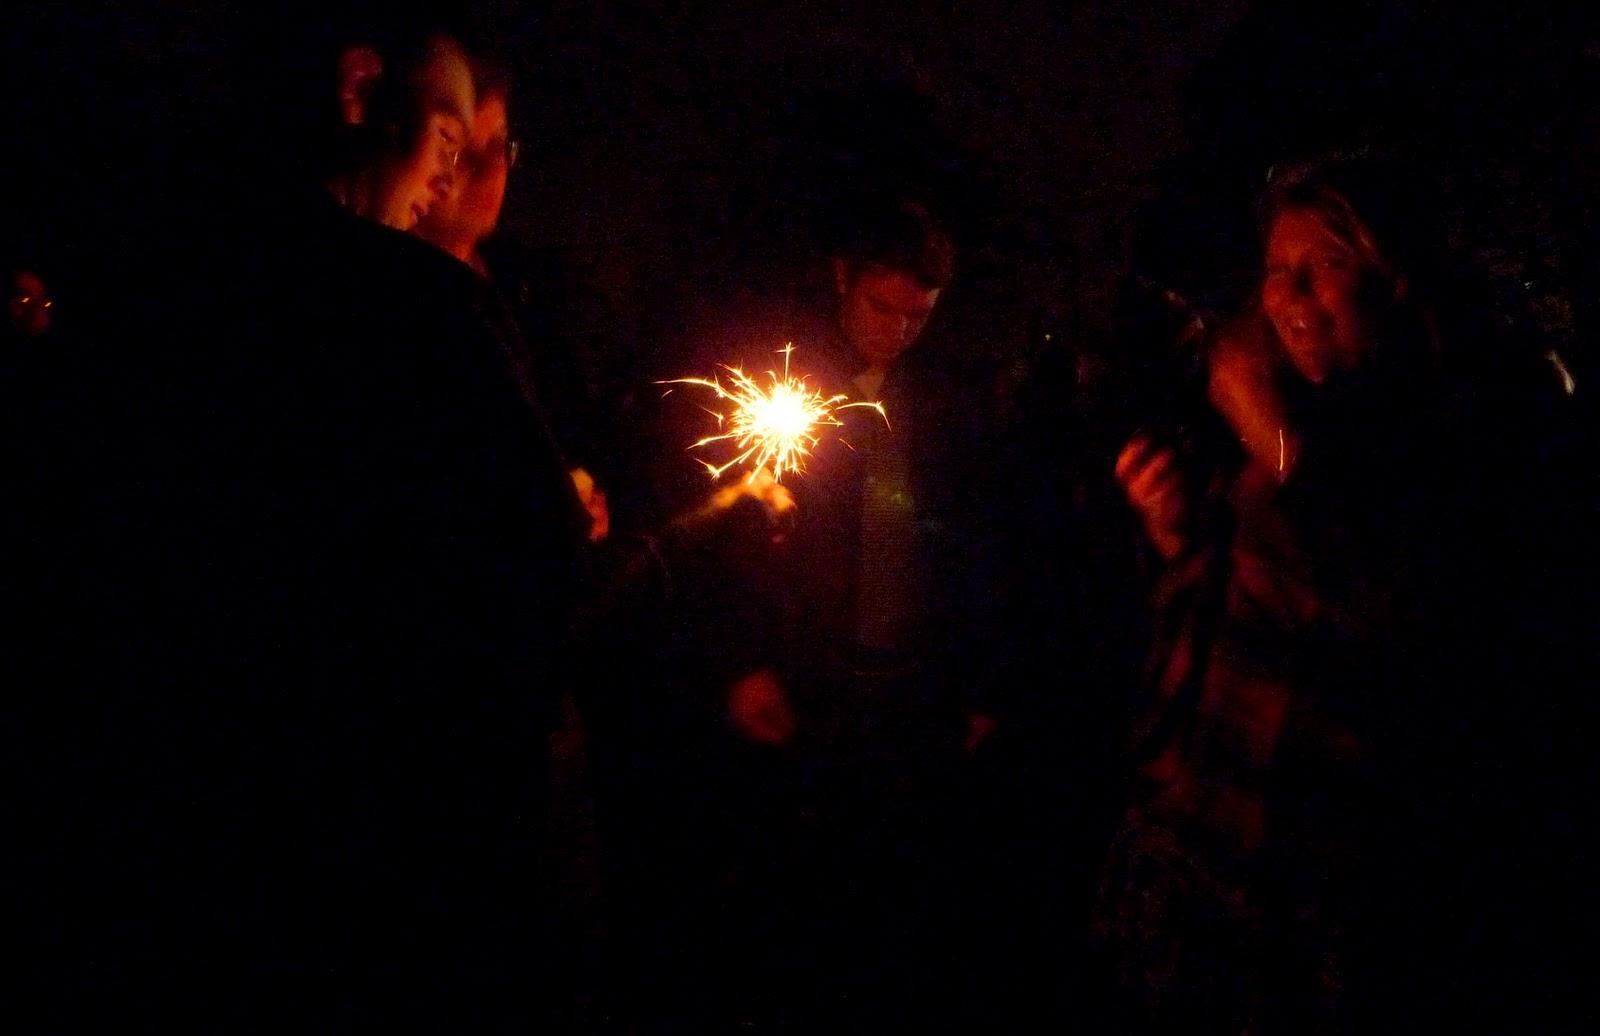 http://1.bp.blogspot.com/_3twvXJ1r1v0/TNcglG4YufI/AAAAAAAAAHc/pF58JoCNQkg/s1600/Guy+Fawkes+Bonfire+Night+020-1.JPG